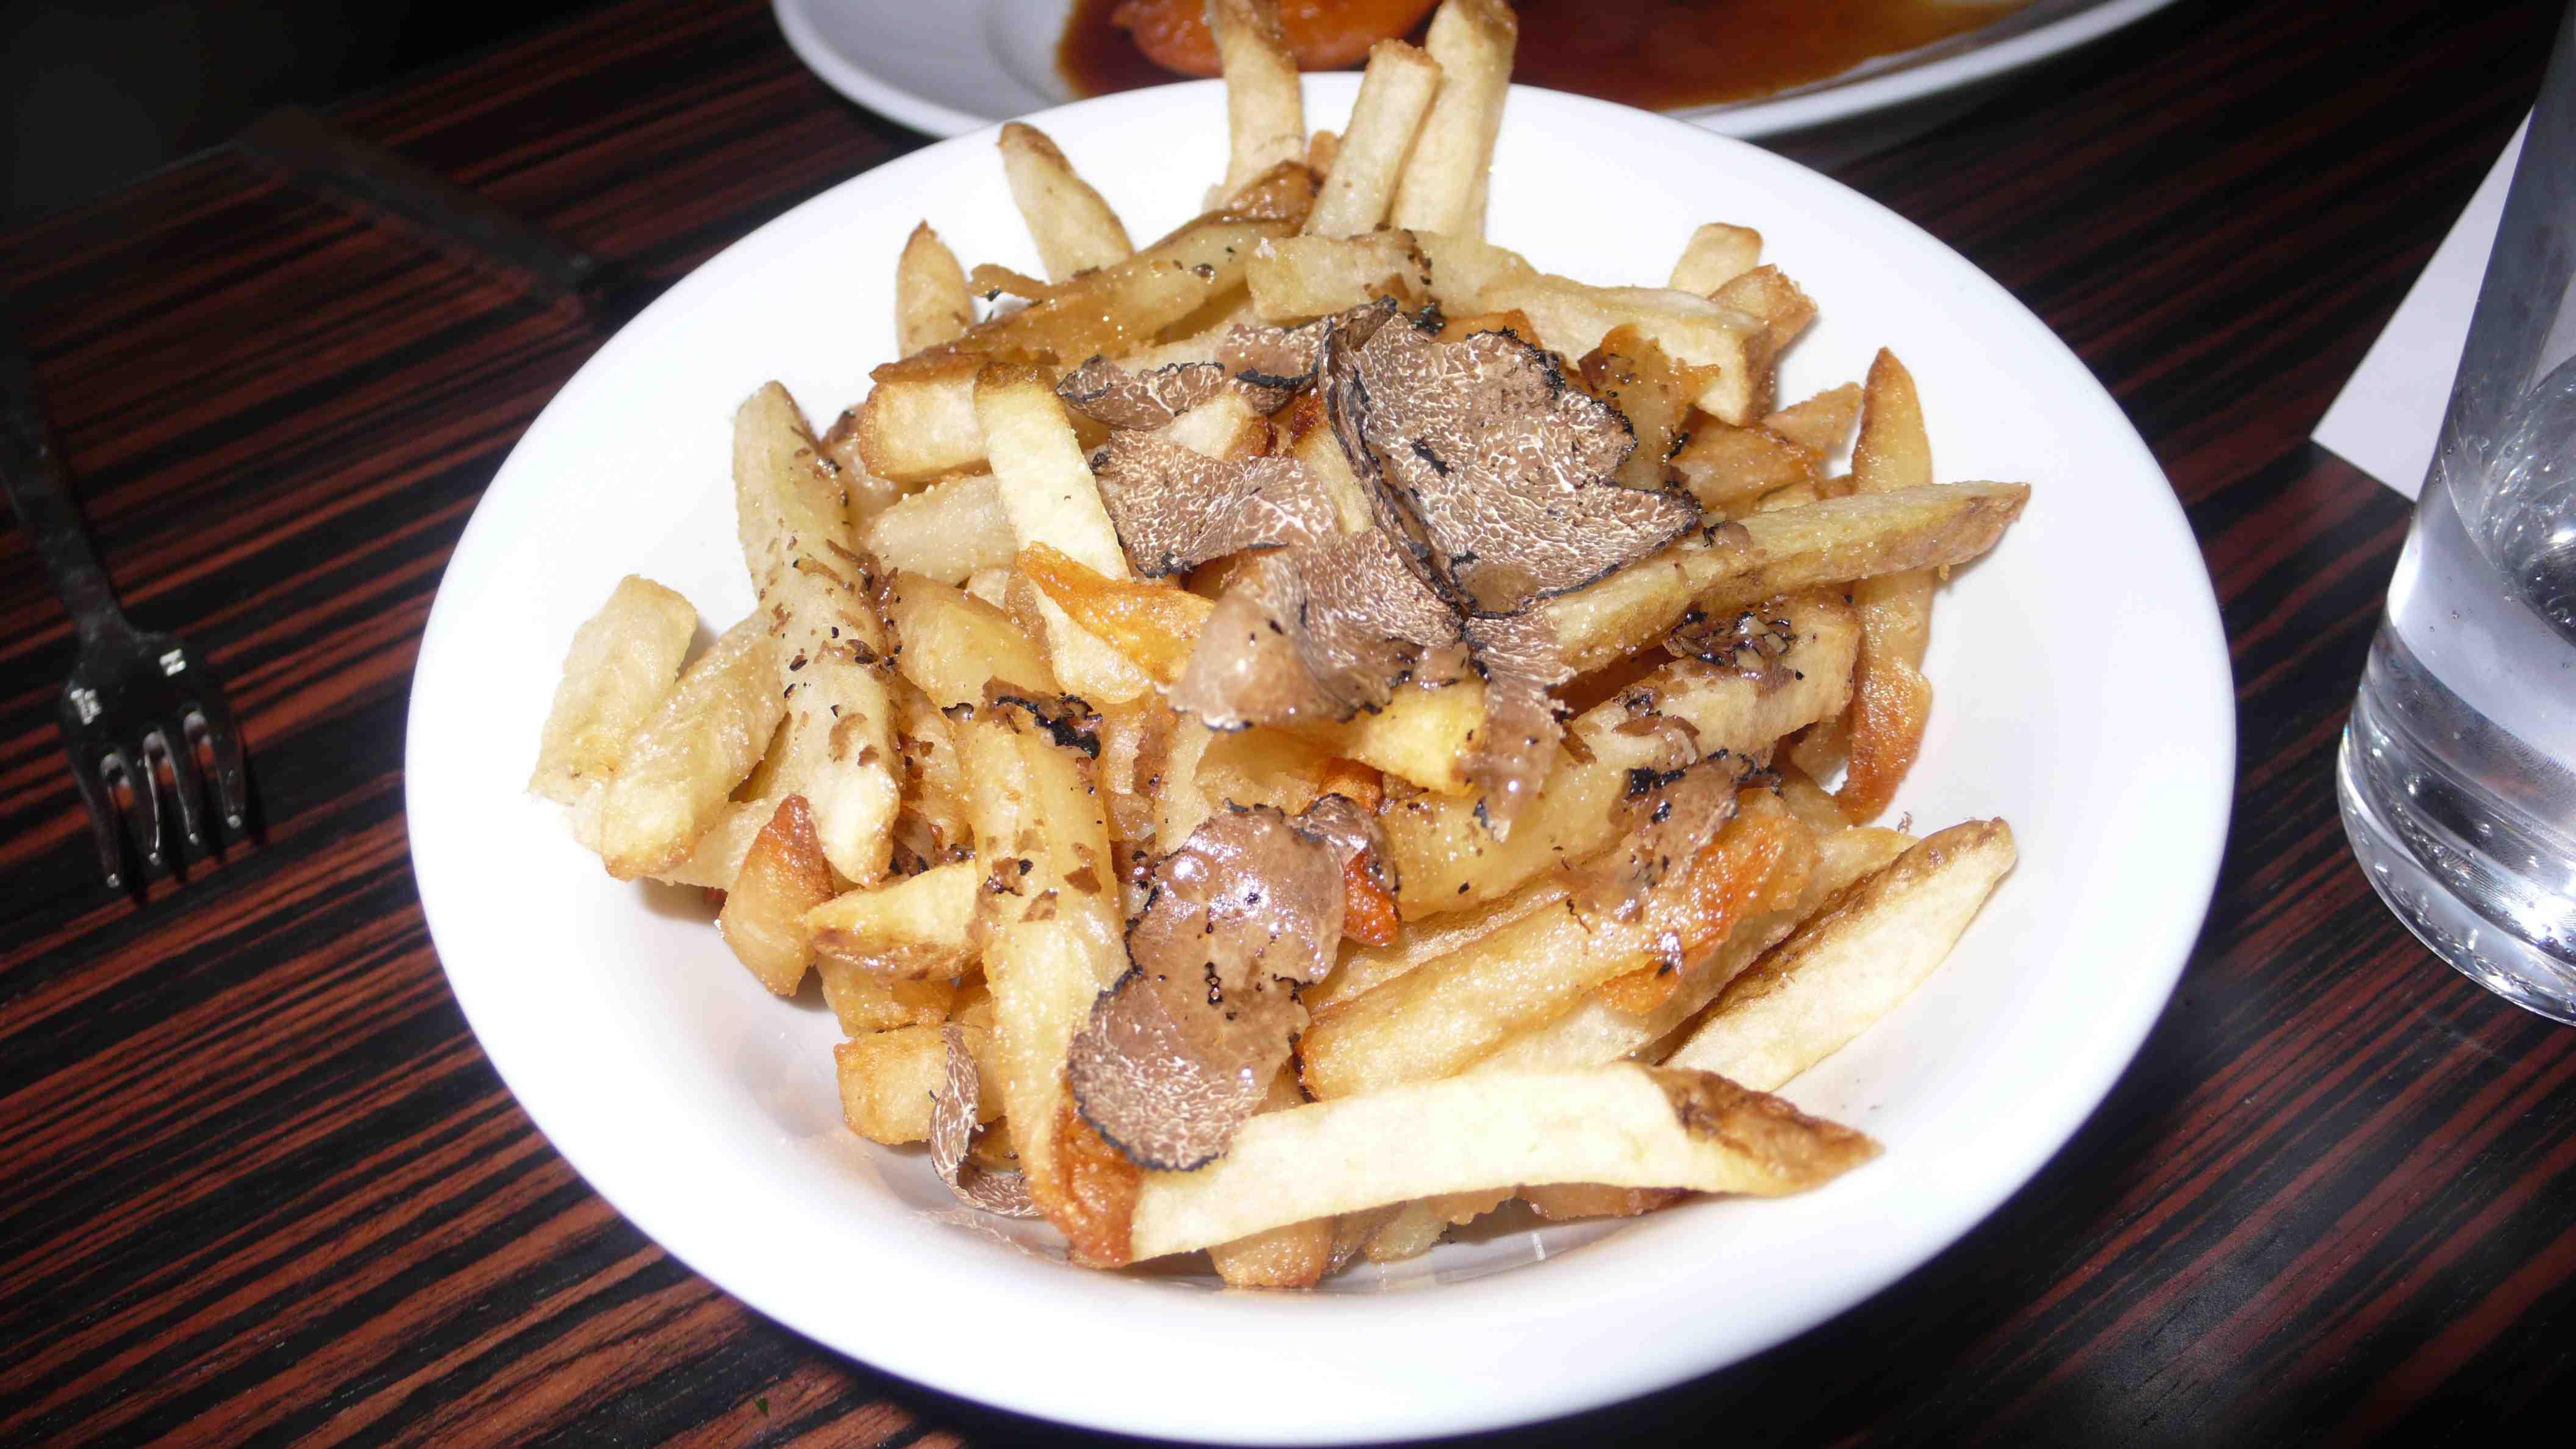 Triple fried truffle french fries